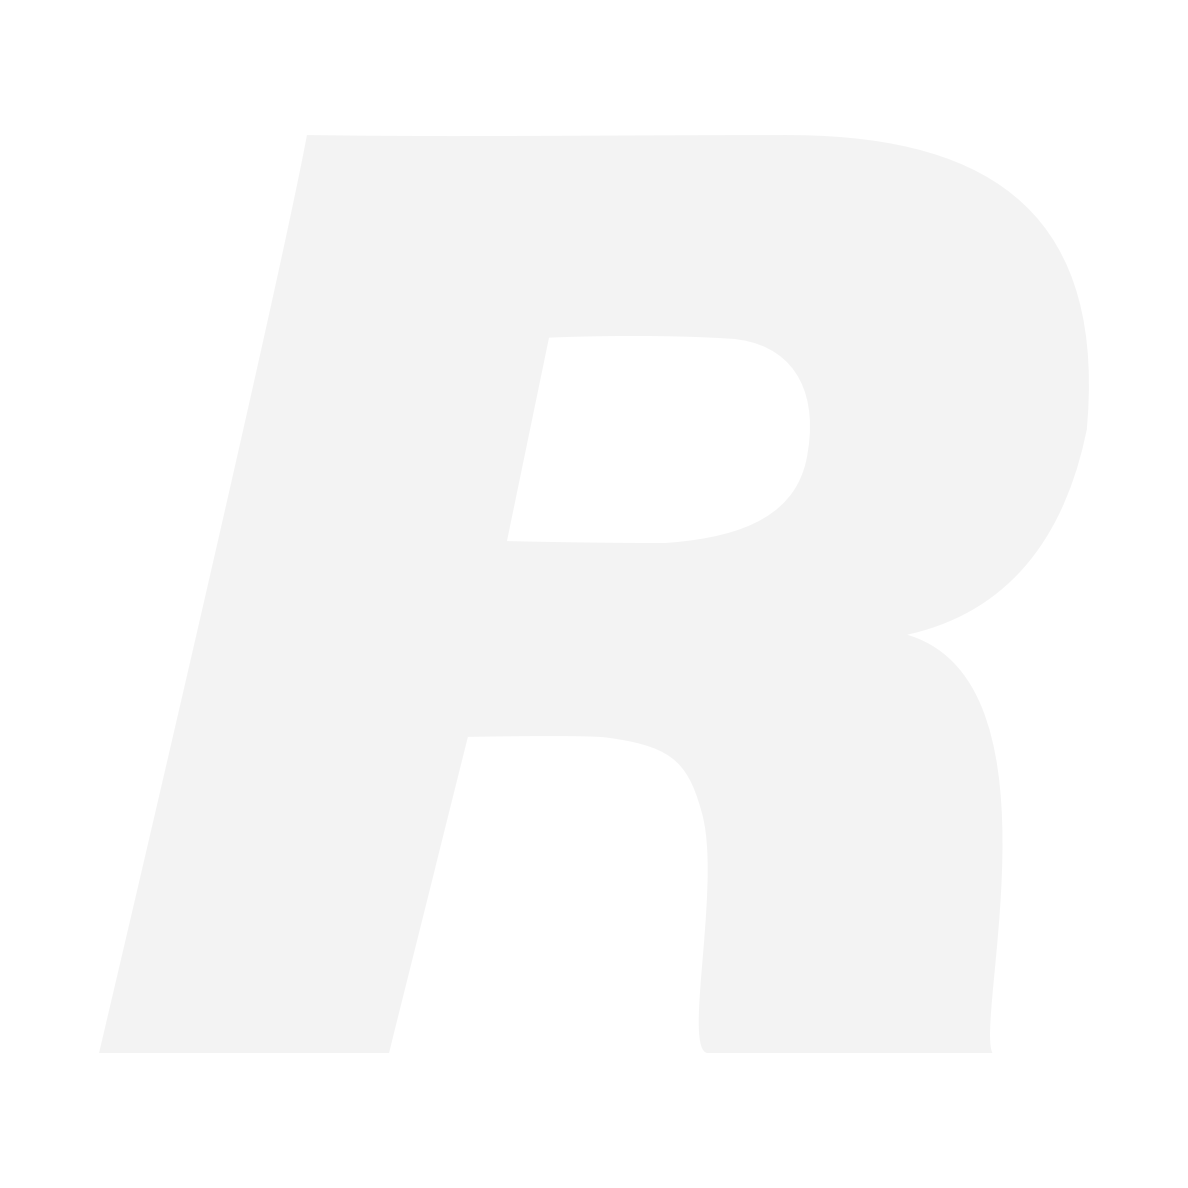 GoPro Rechargeable Battery (Hero 5 Black)